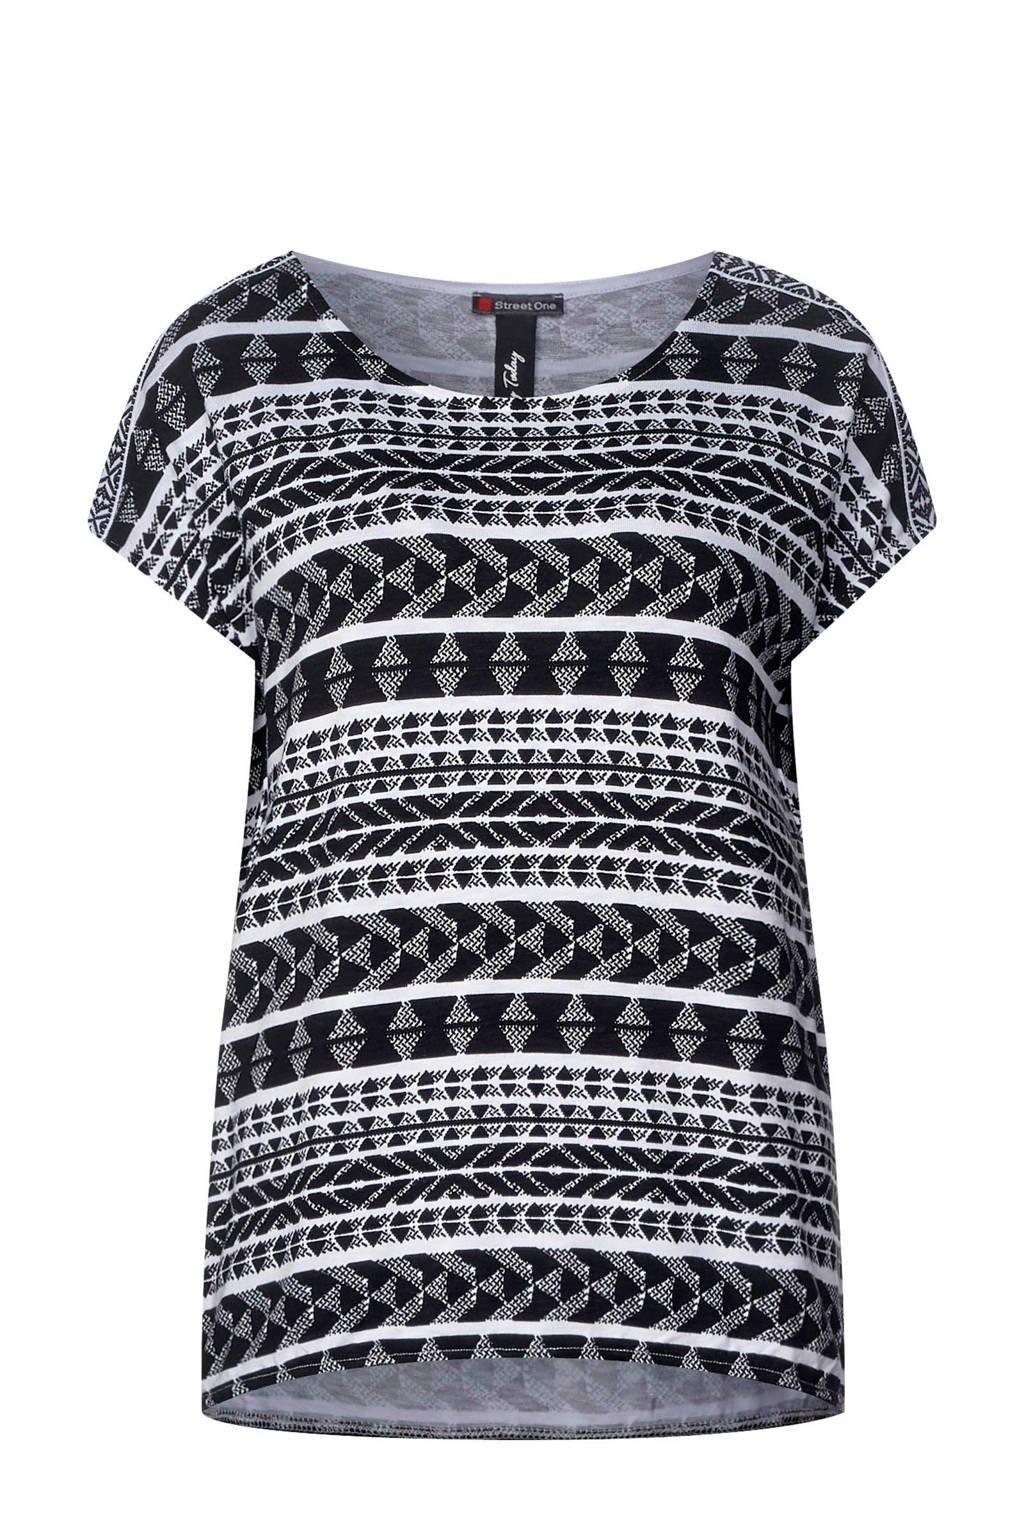 Street One T-shirt met printopdruk en pailletten, Zwart/groen/roze